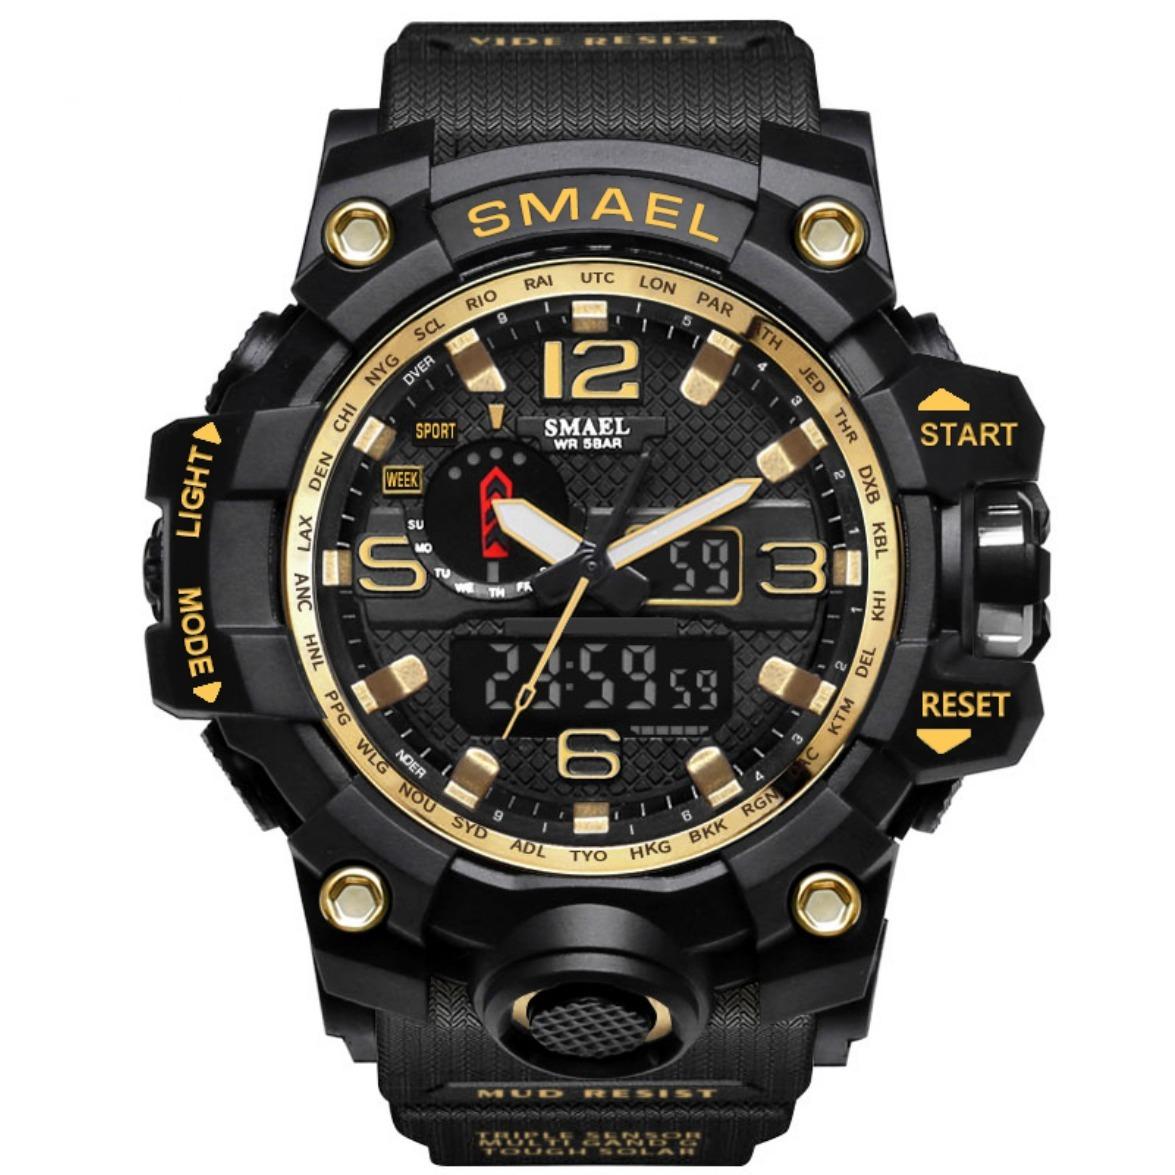 04b28dfacc6 Relógio Masculino Esportivo Militar A Prova D